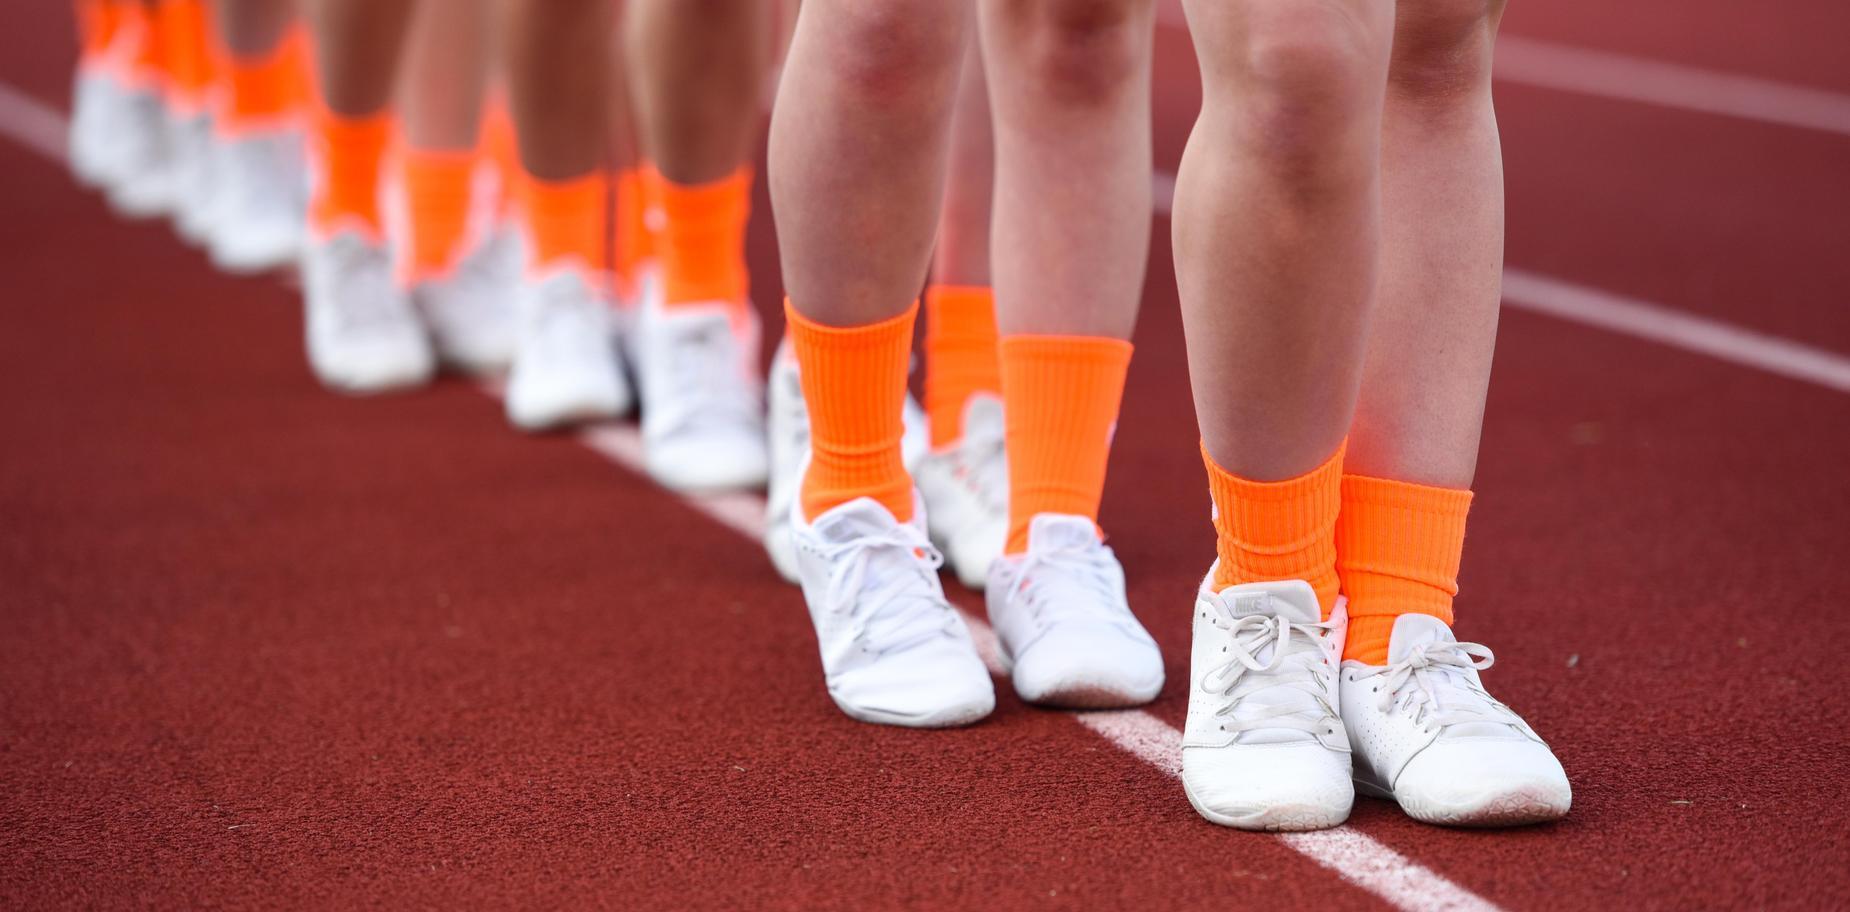 cheer squad in orange socks for Orange Out